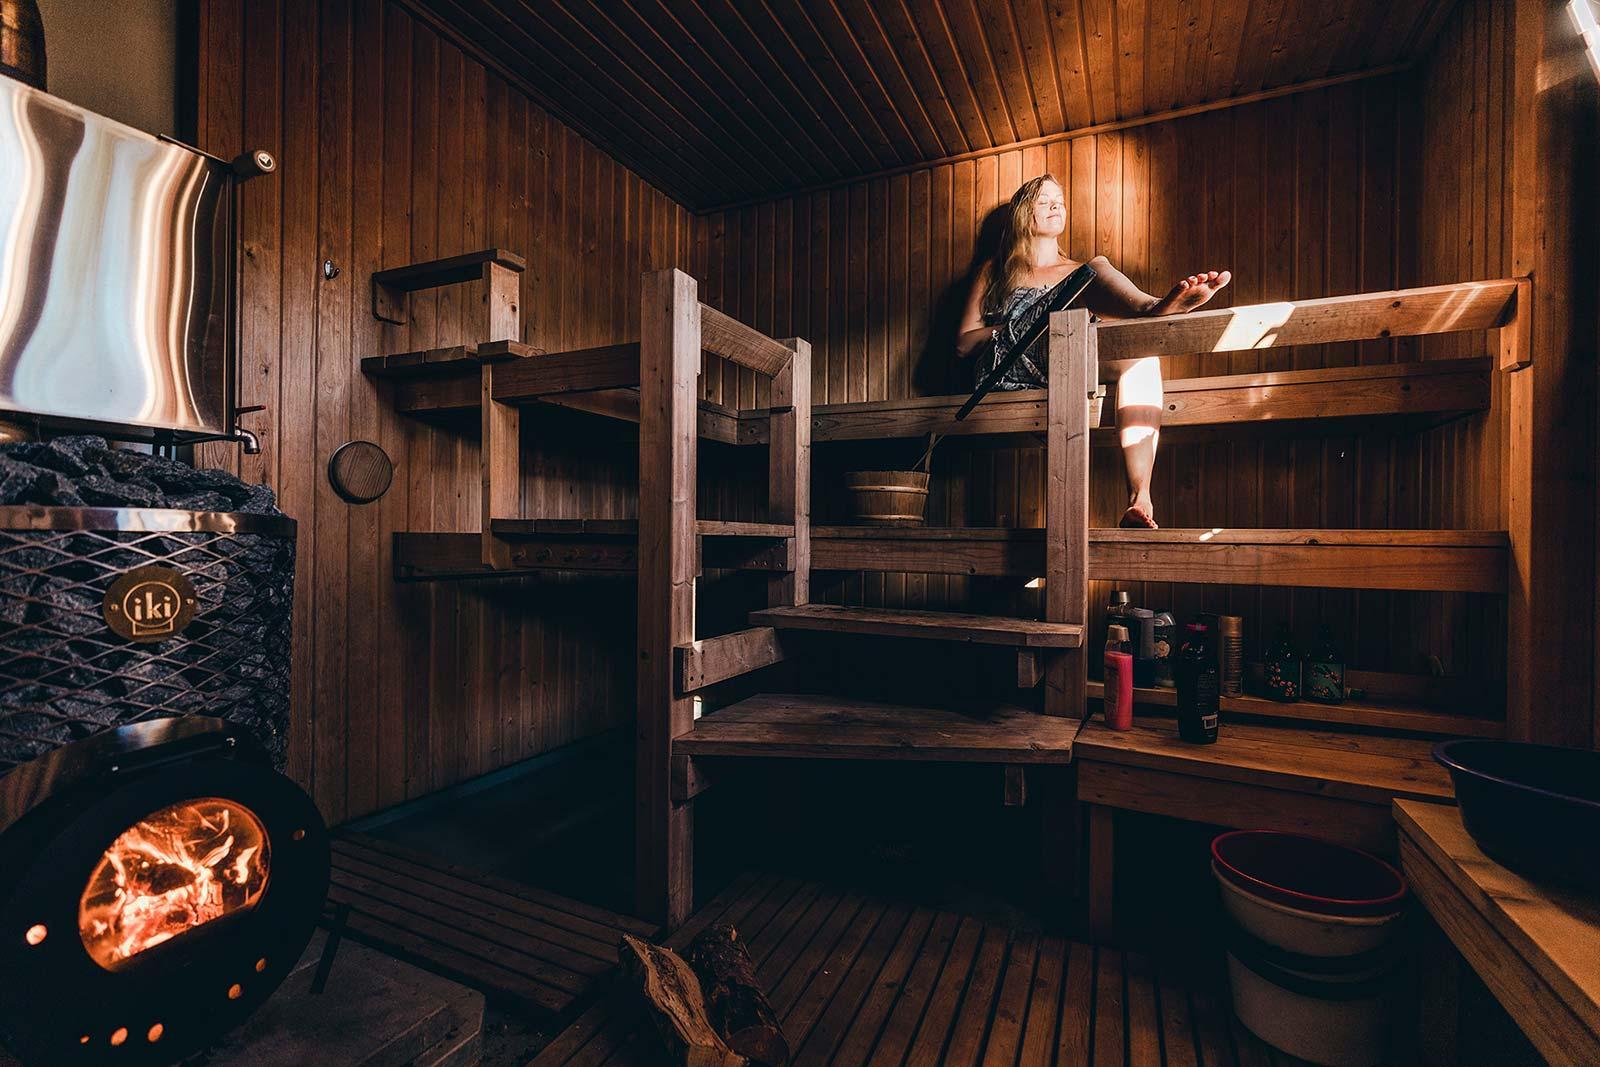 finland-sauna-nation